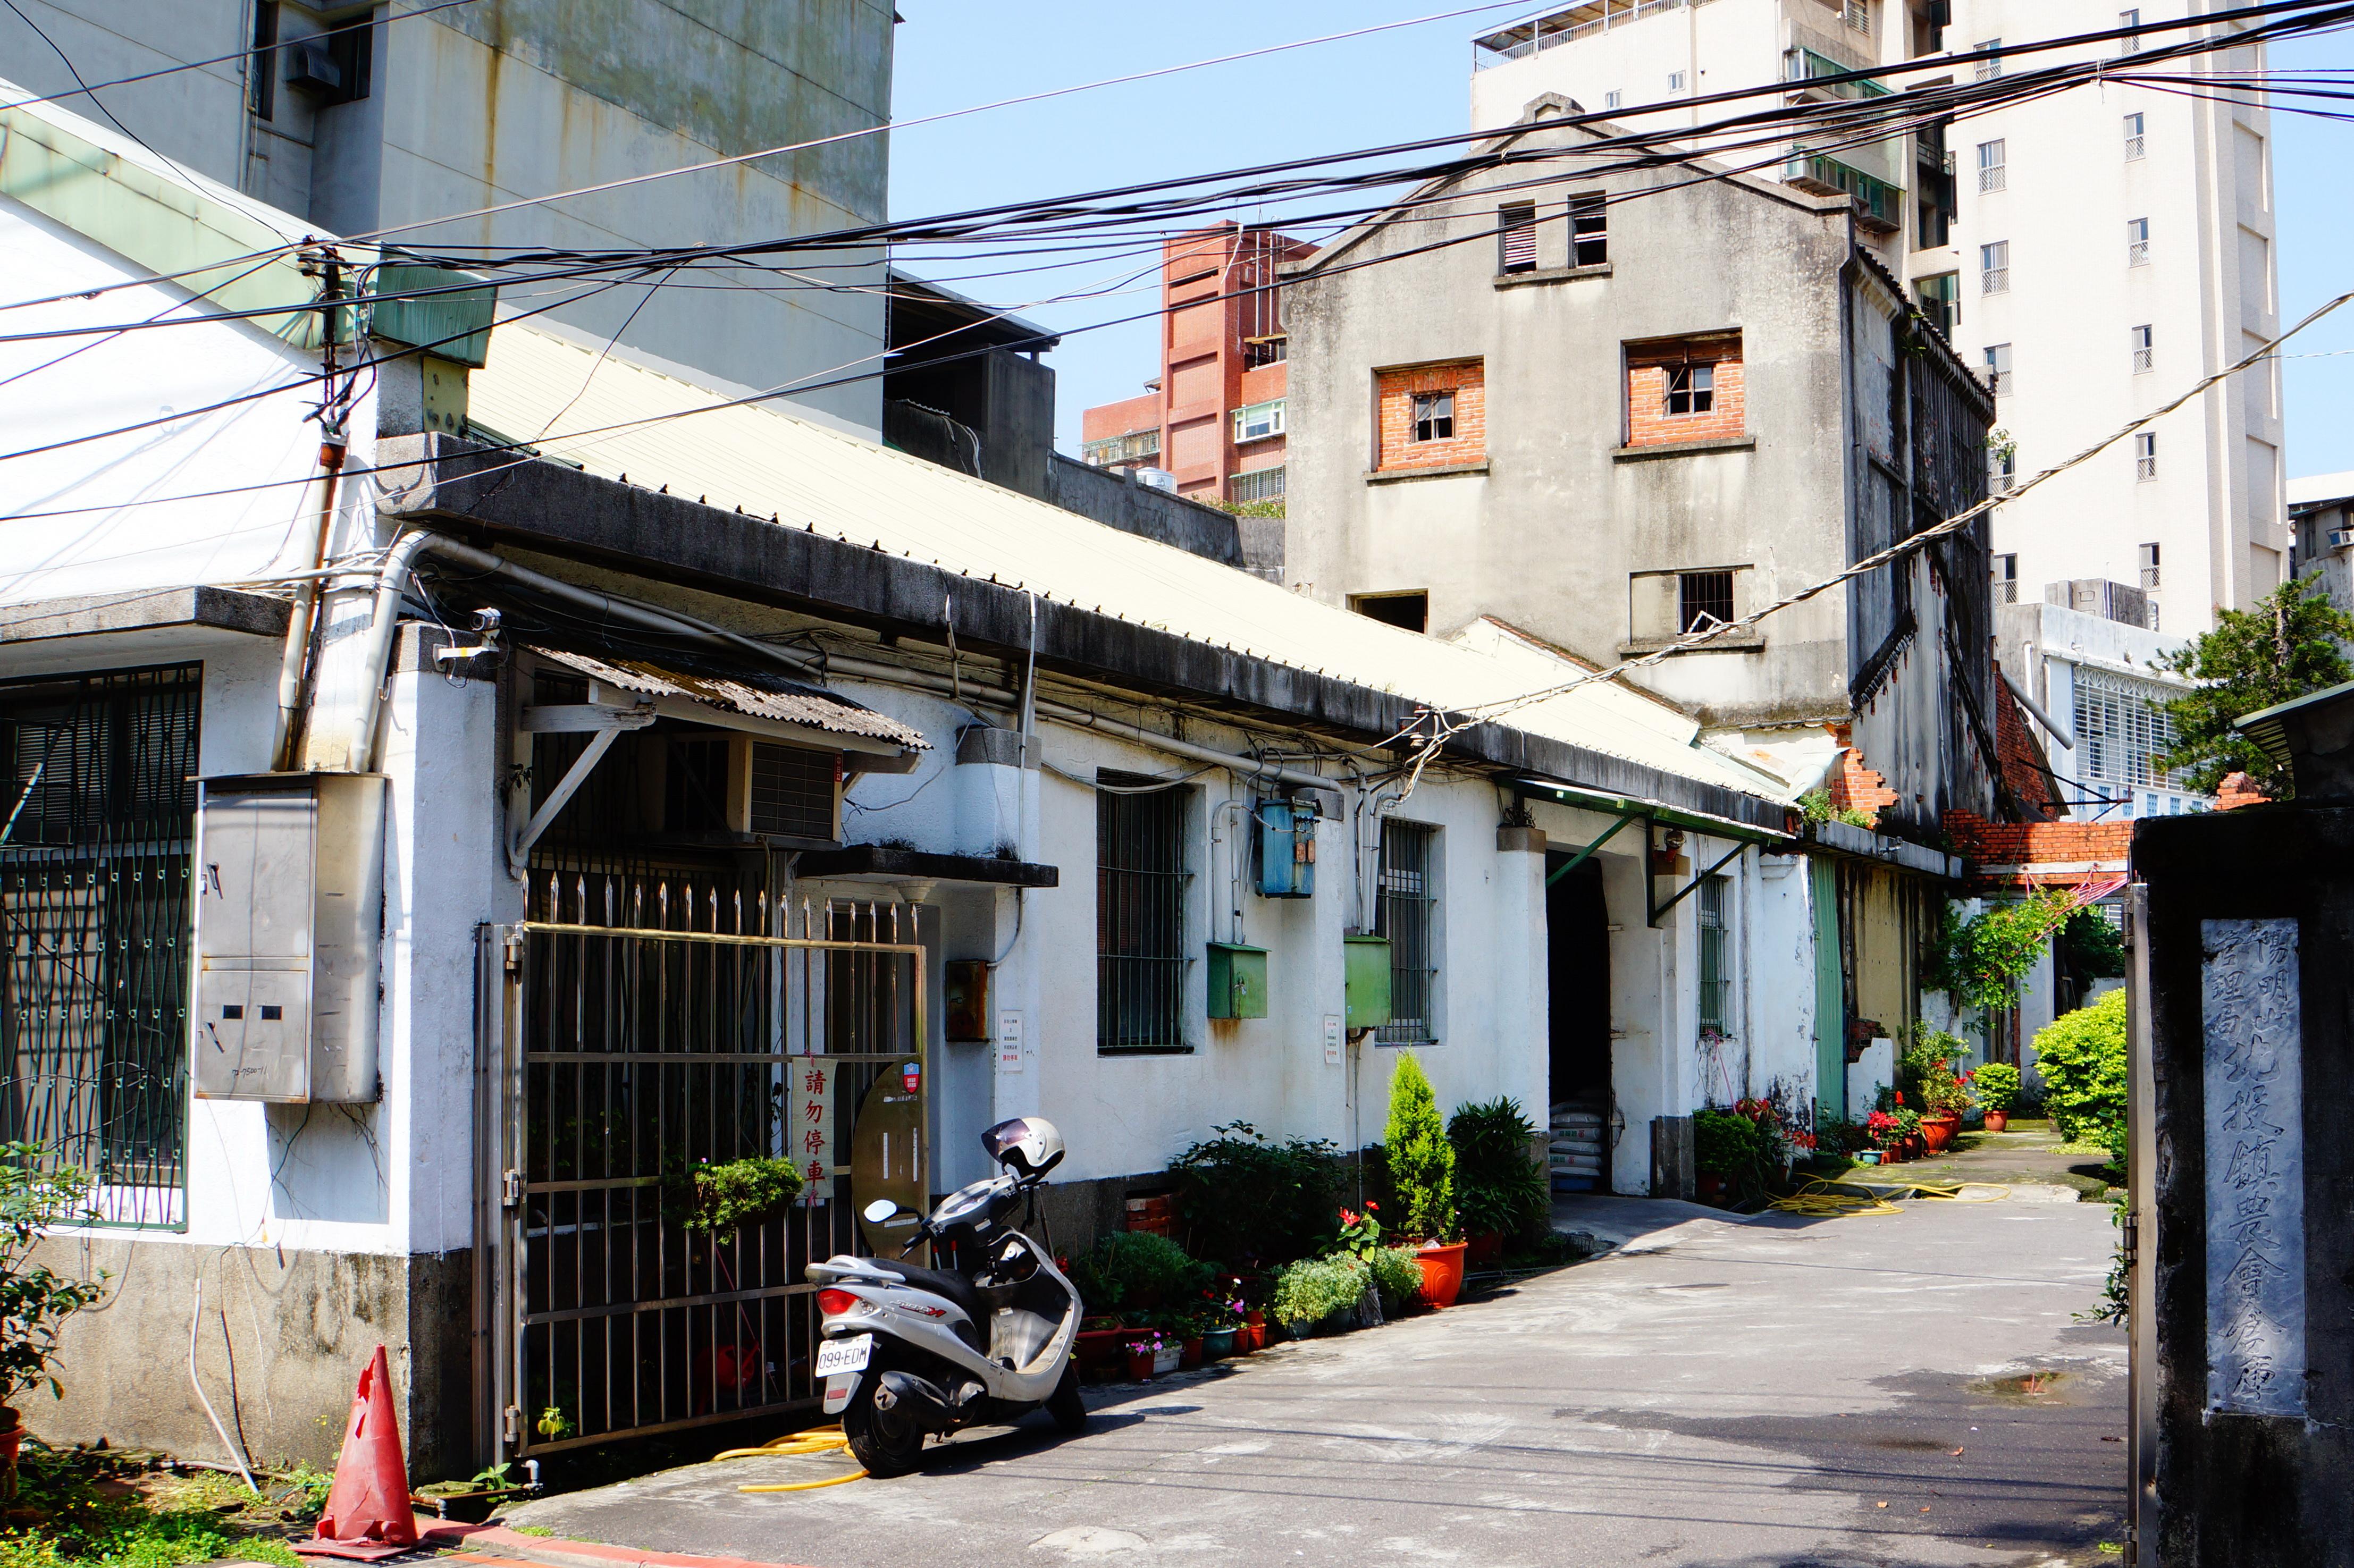 File:北投穀倉碾米機房 Rice Milling Room of Beitou Barn - panoramio ...